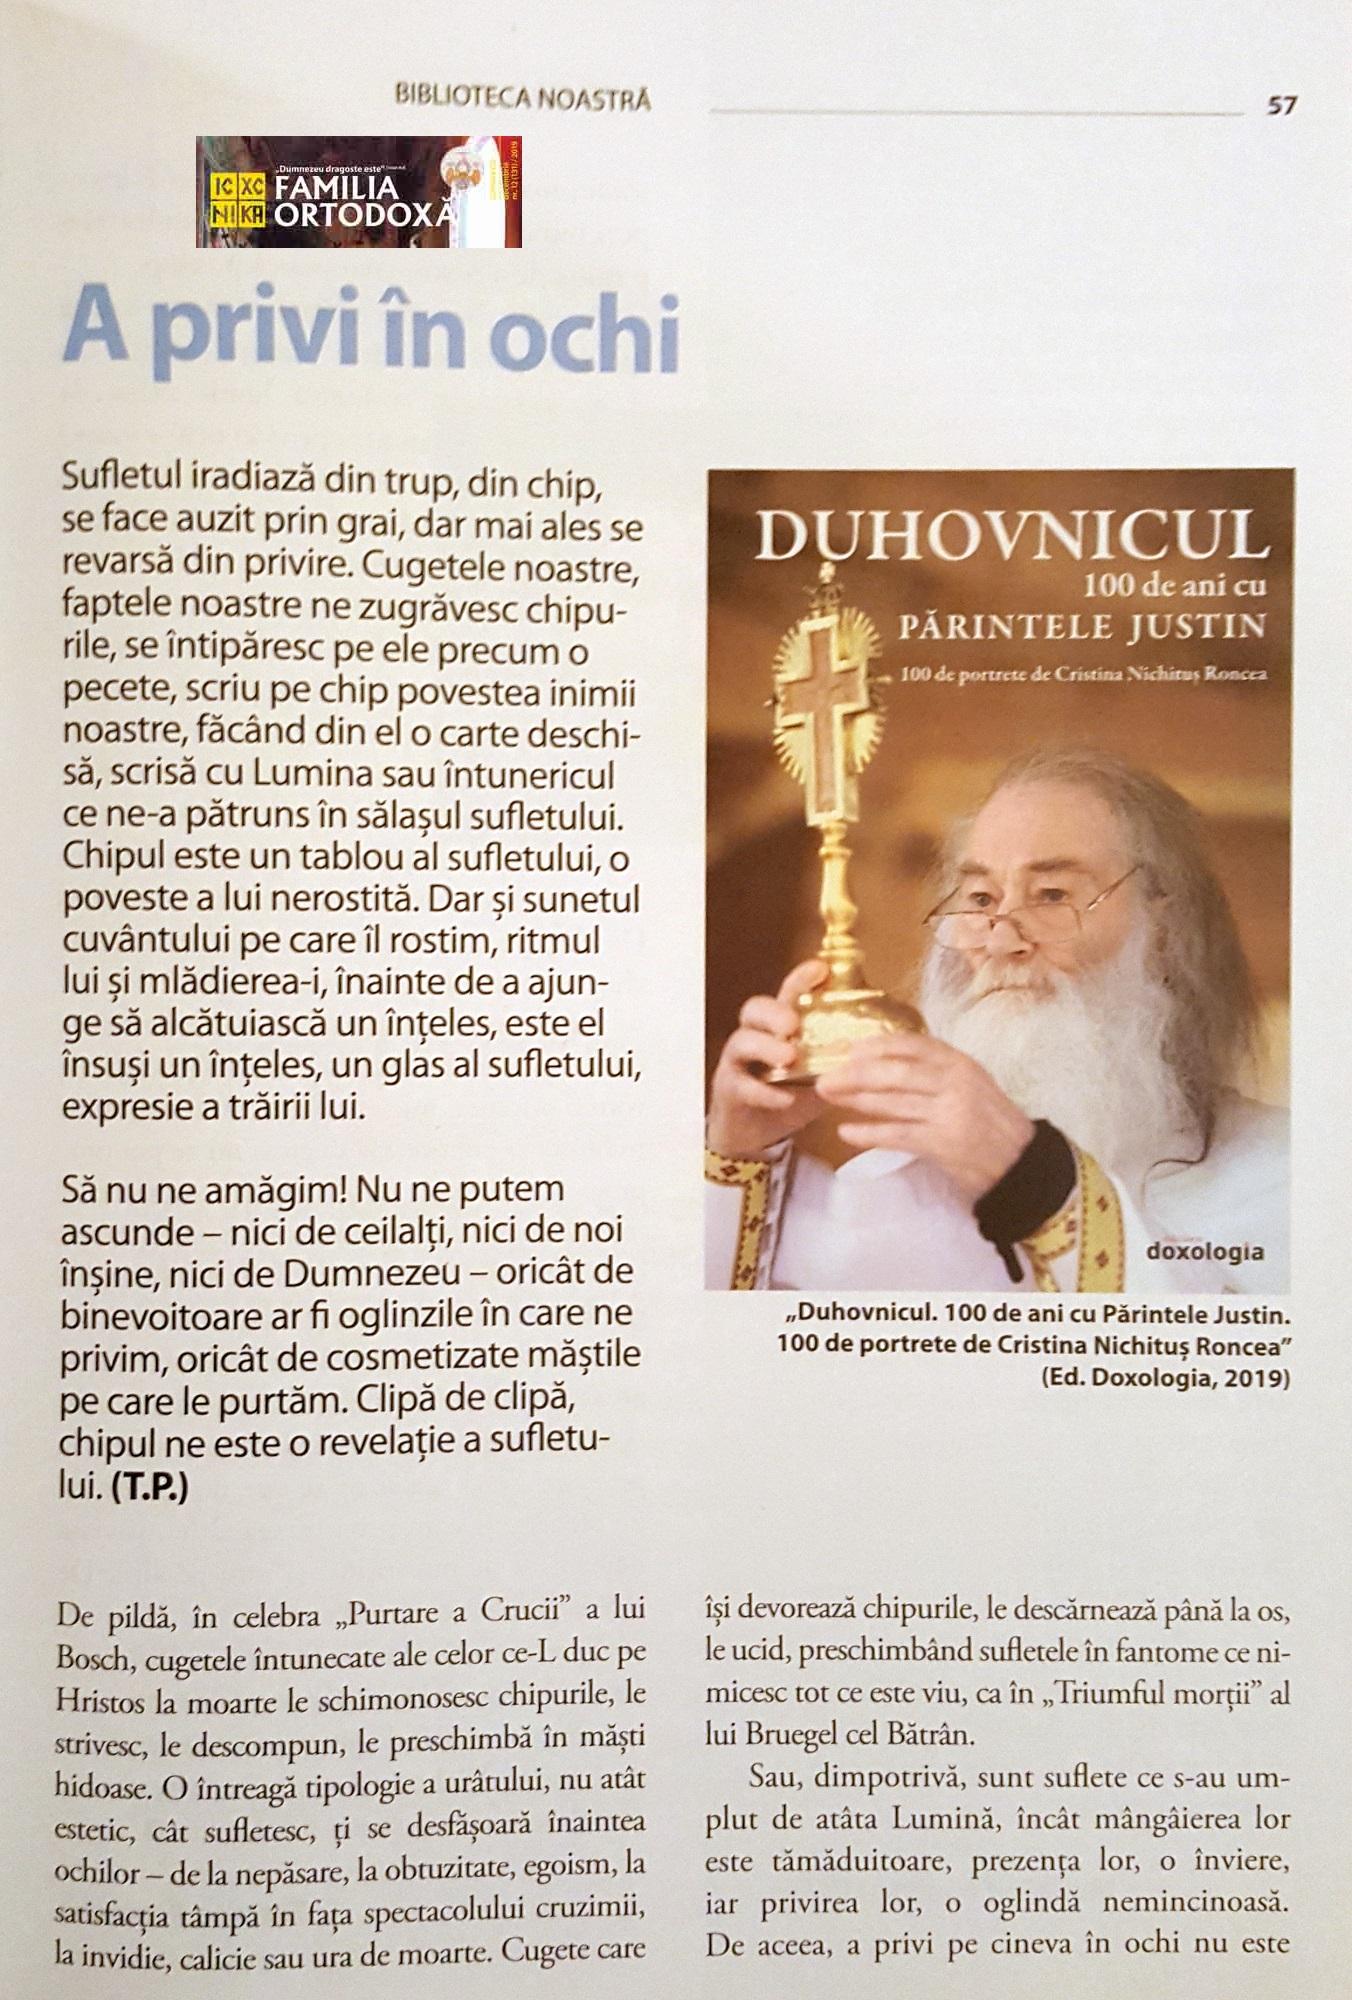 Parintele Justin Parvu - Duhovnicul - Cristina Nichitus Roncea - Familia Ortodoxa 12 - 2020 - 1